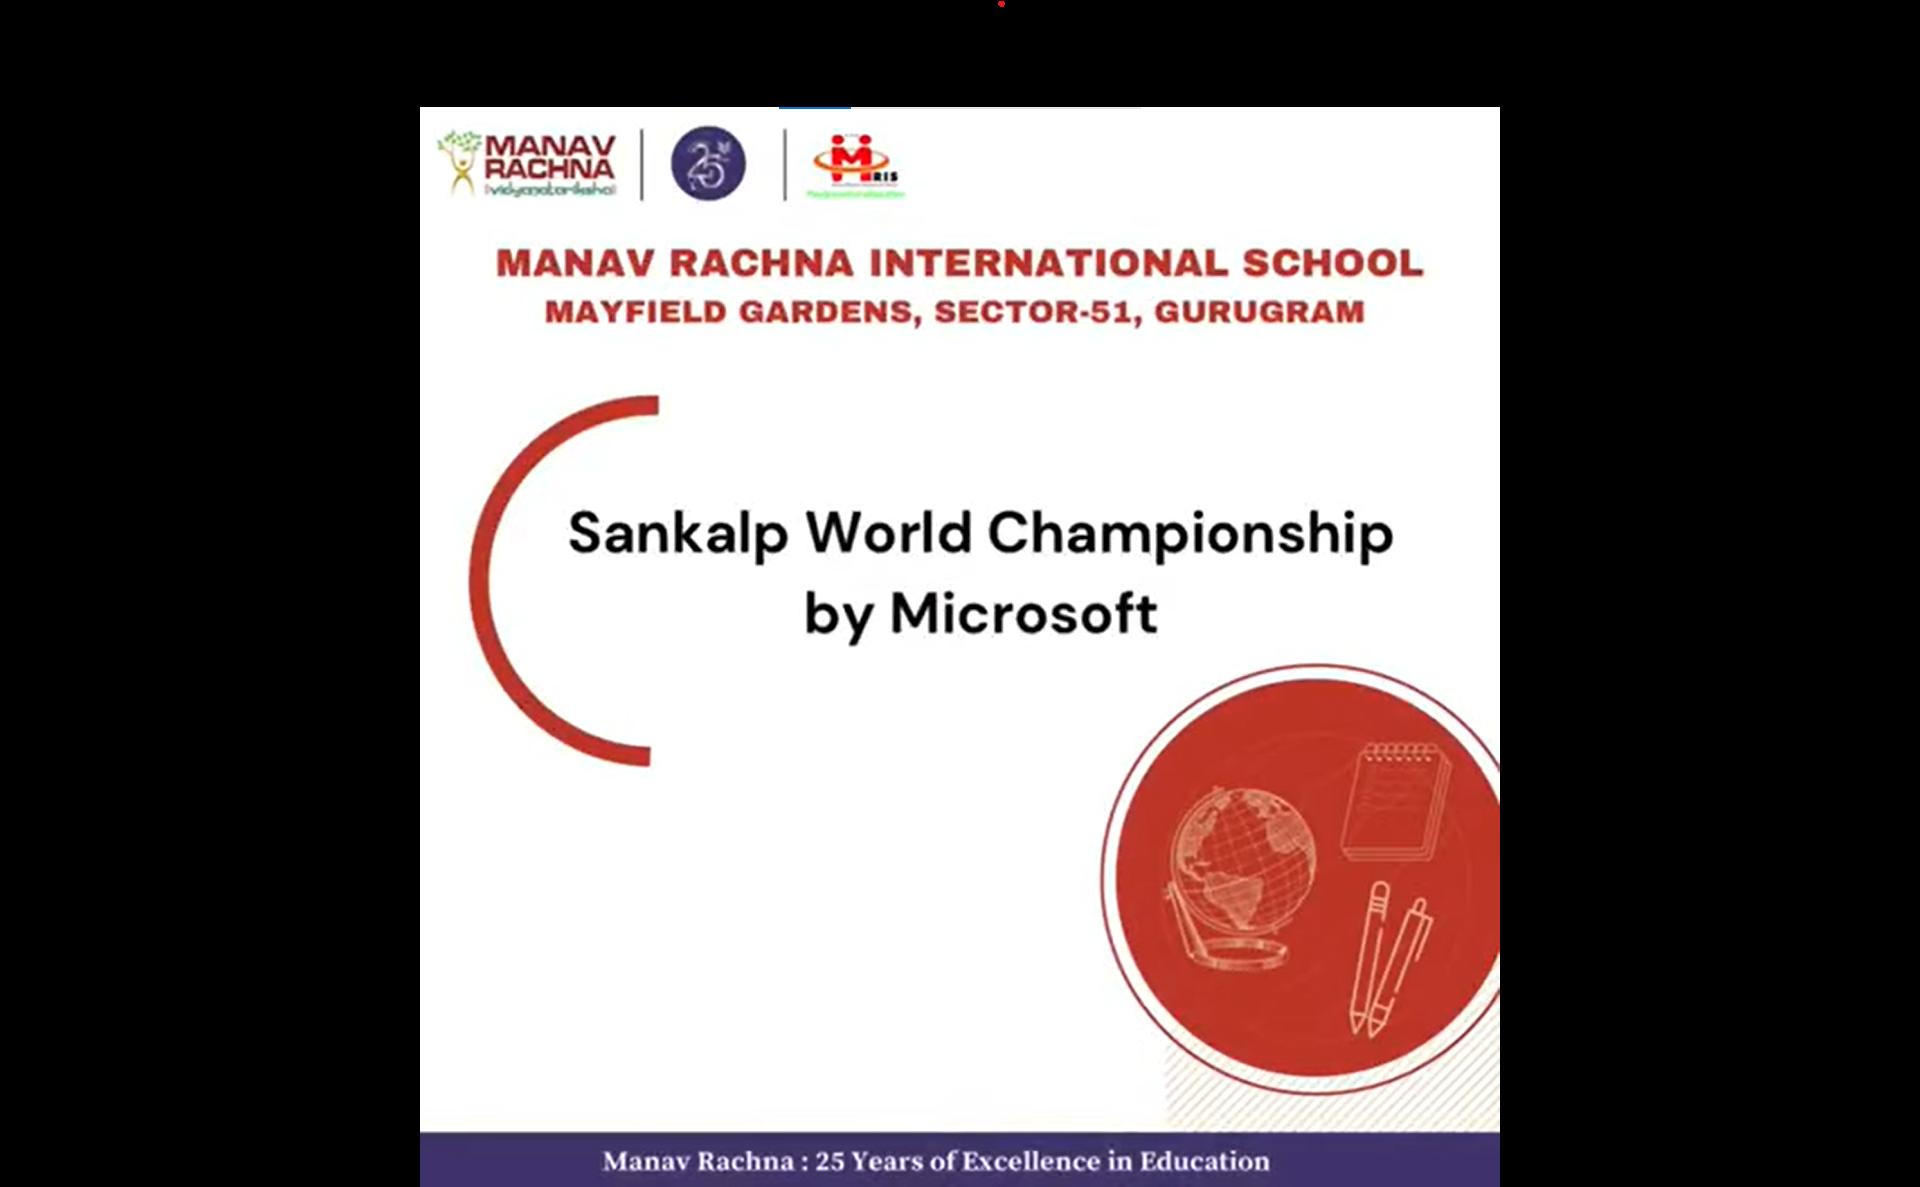 Students shine at Sankalp World Championship by Microsoft